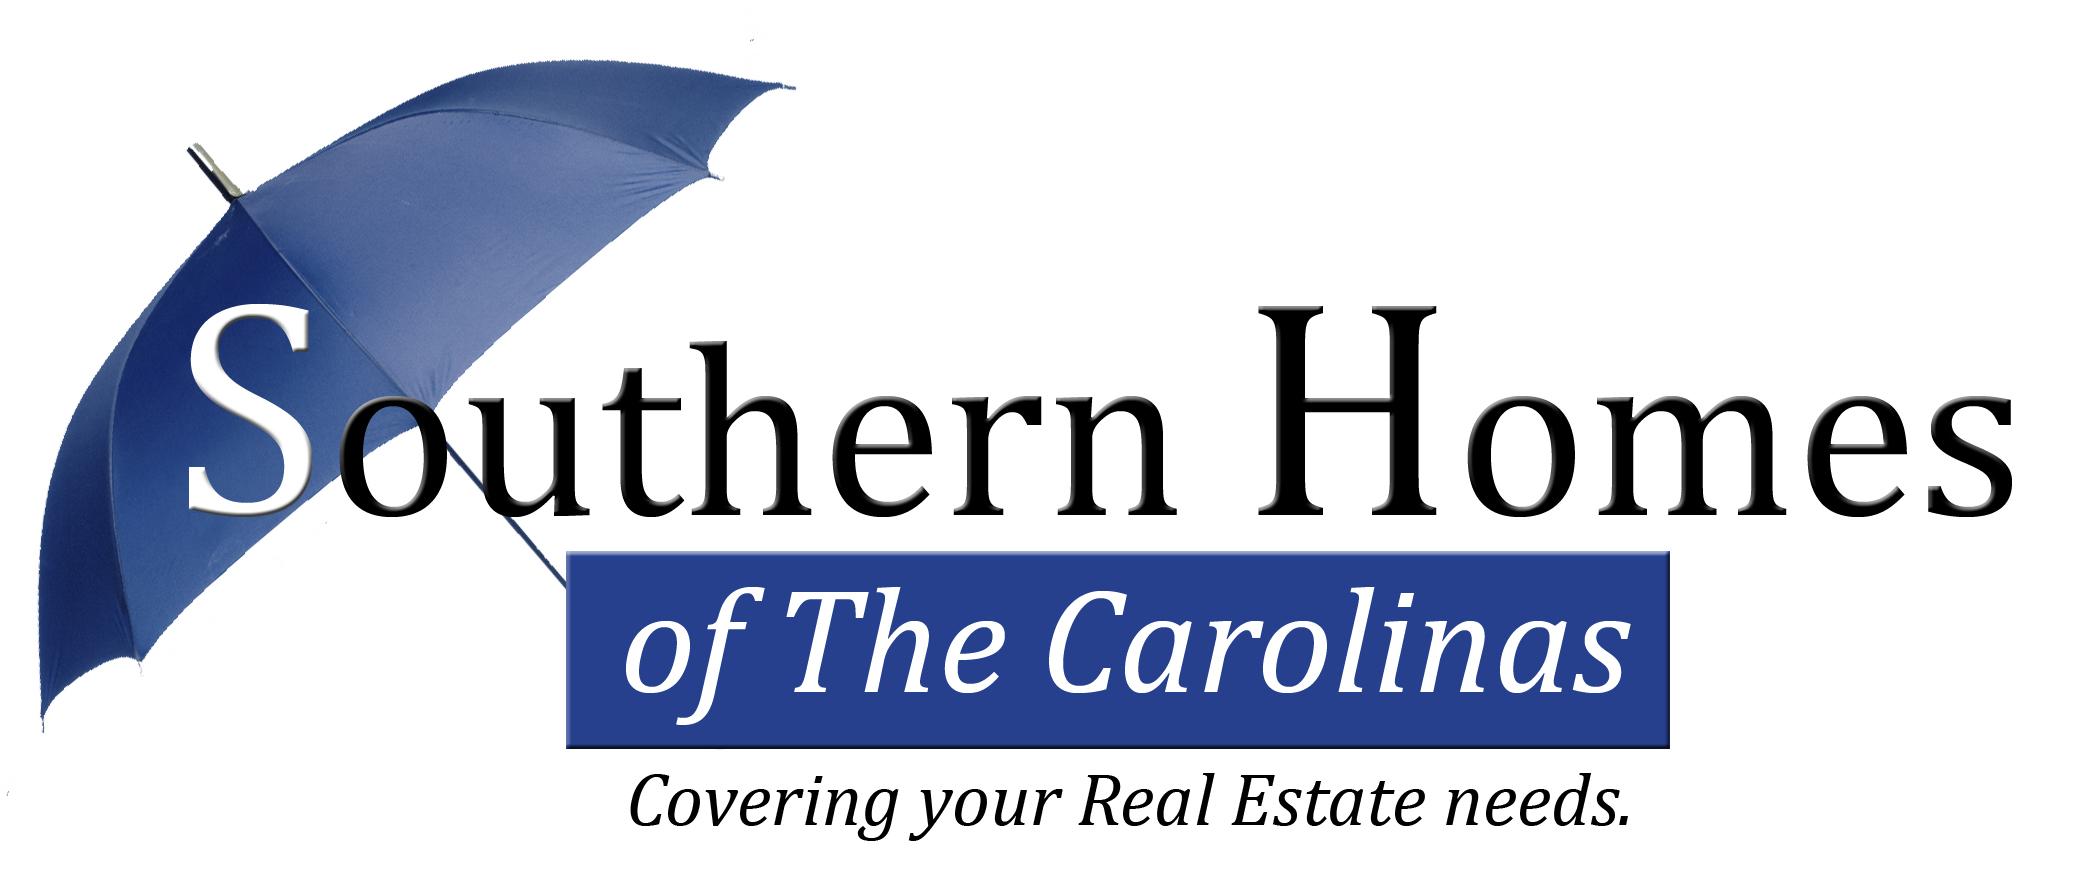 Rachel Payton for Southern Homes of the Carolinas